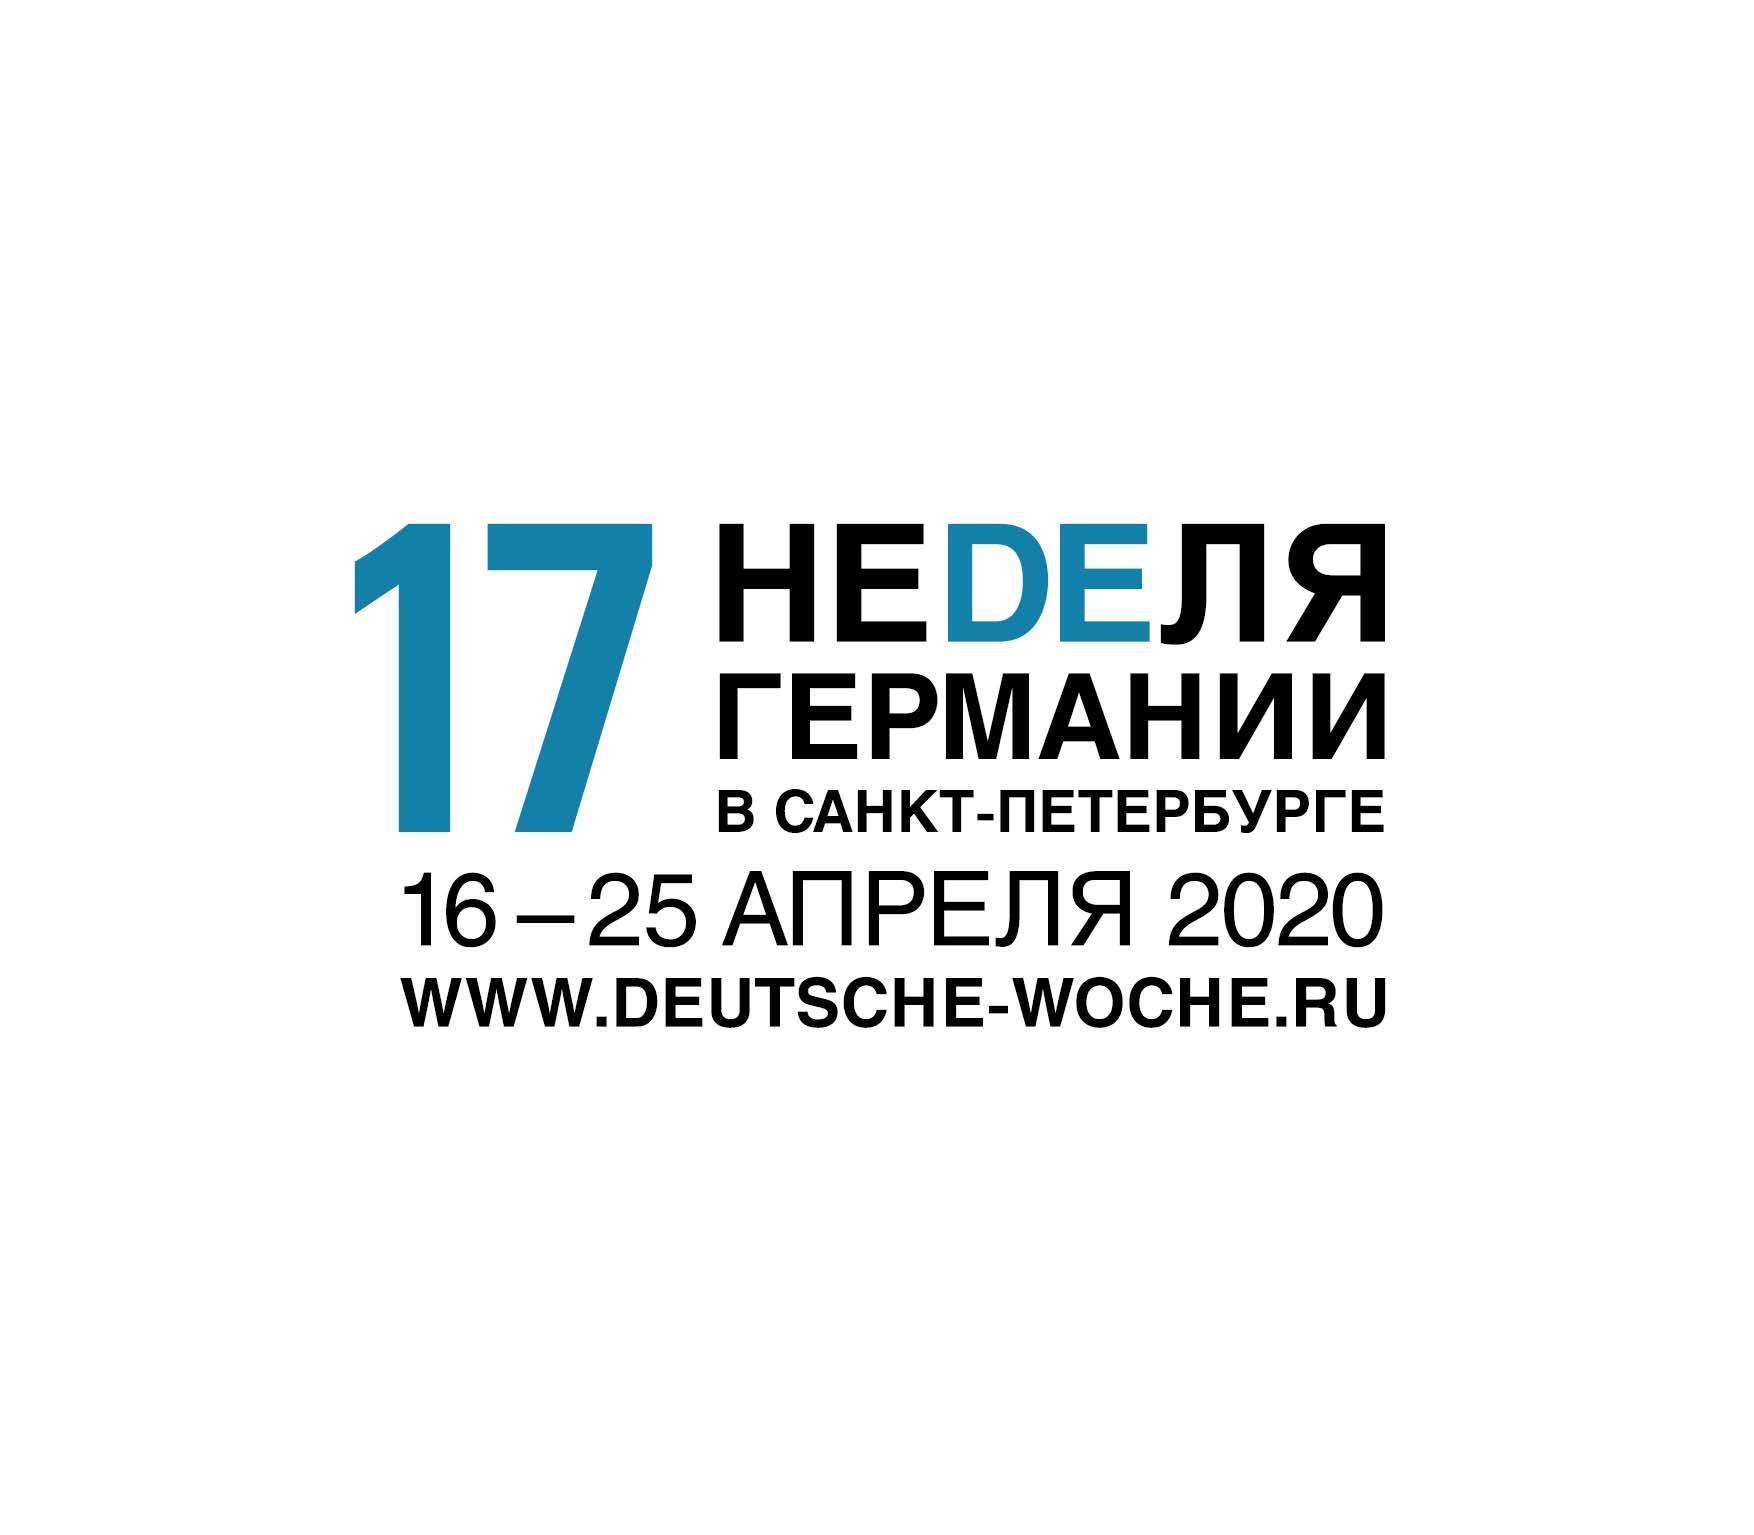 Неделя Германии в Санкт-Петербурге 2020 - Deutsche Woche in St. Petersburg 2020 (Promovideo)